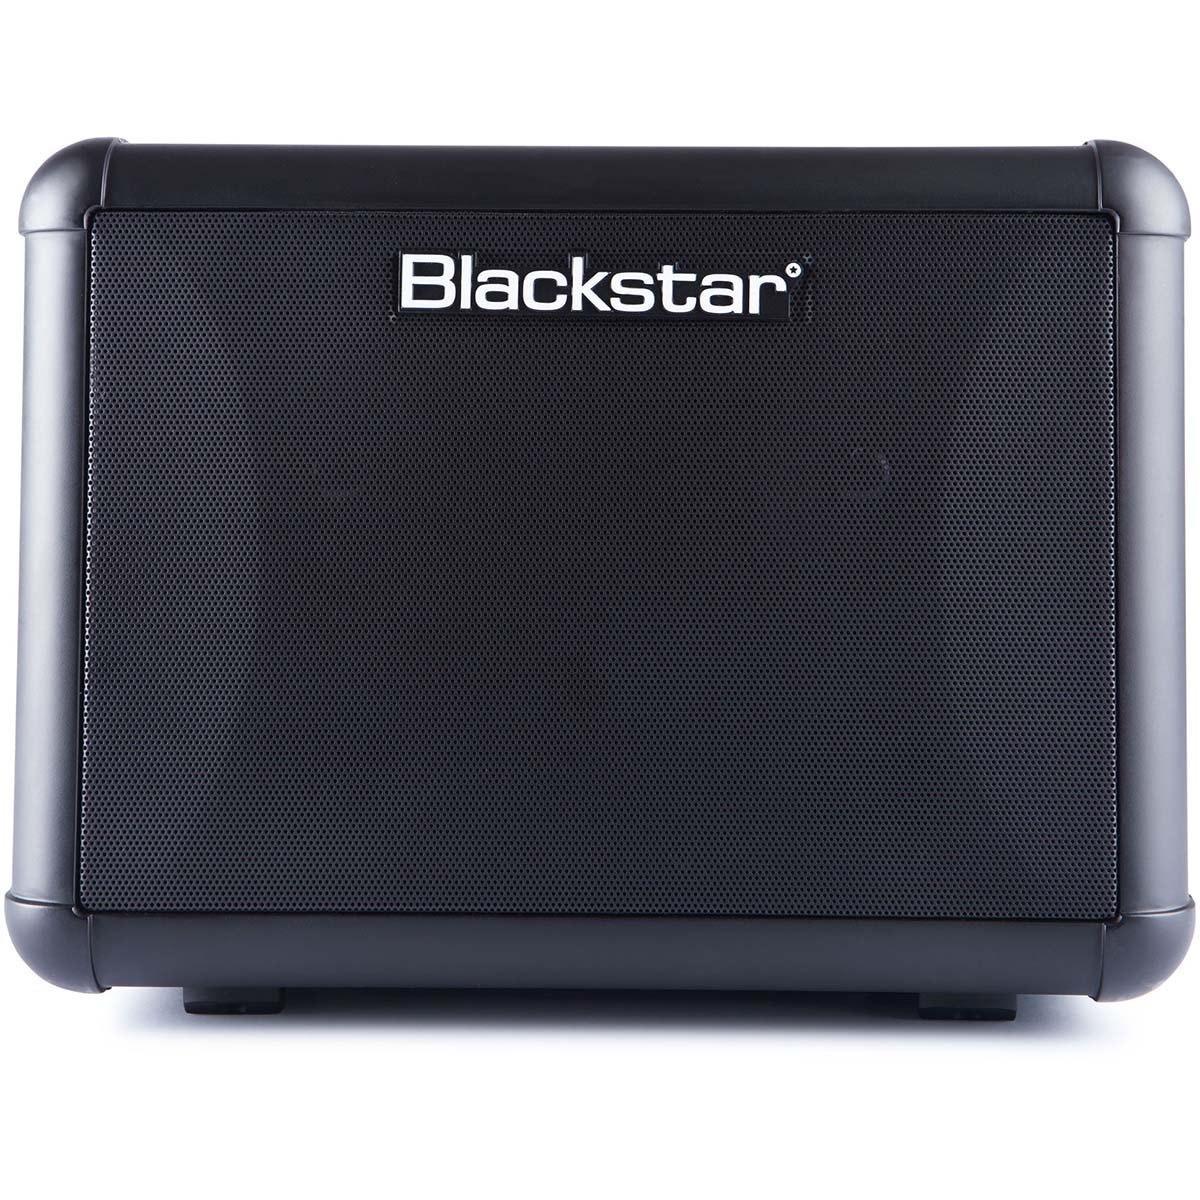 Blackstar Super Fly Bluetooth Combo Guitar Amplifier £129 at Dawsons